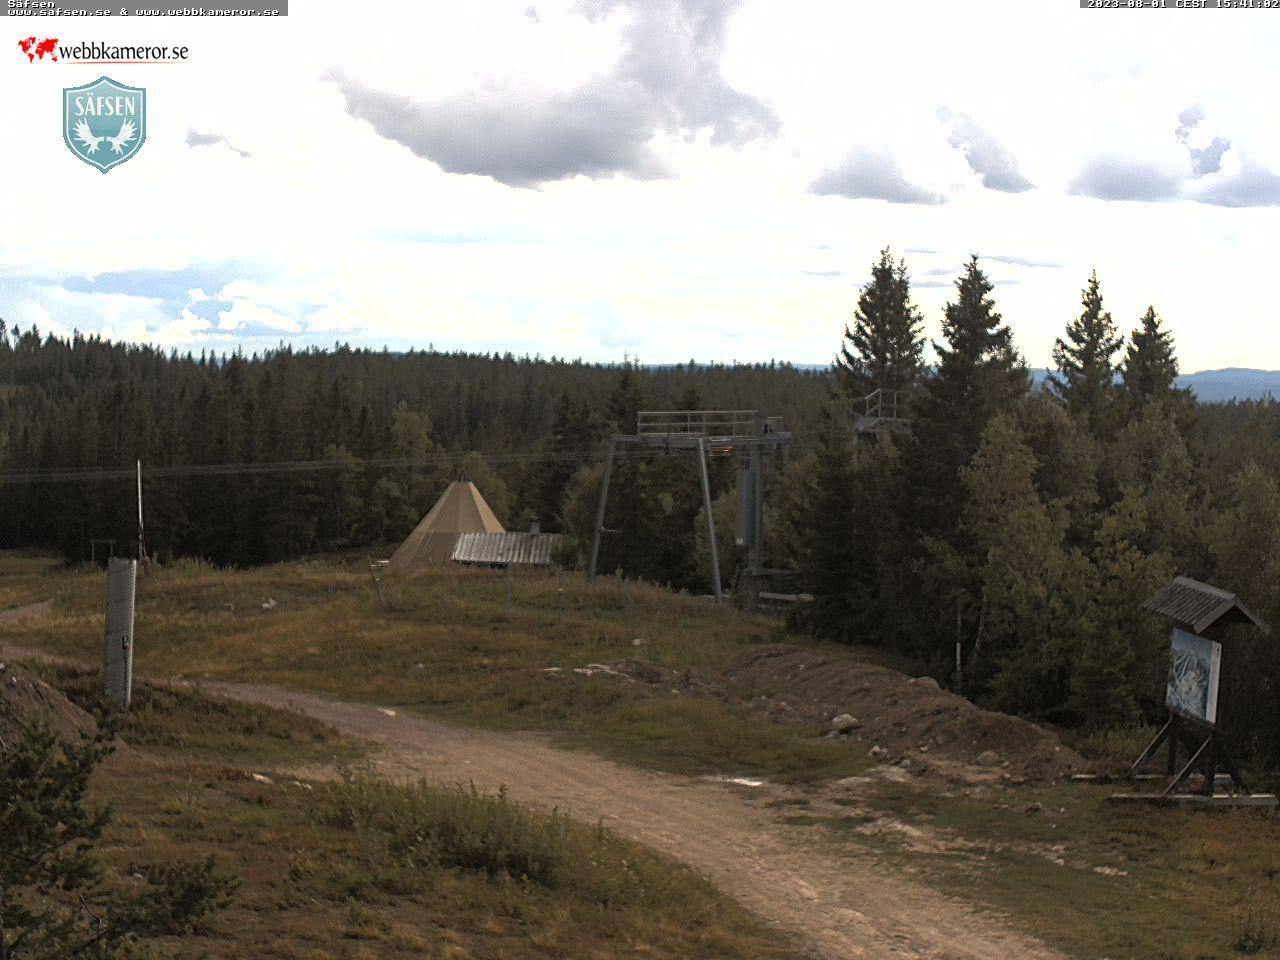 Webbkamera - Säfsen, Fredriksberg